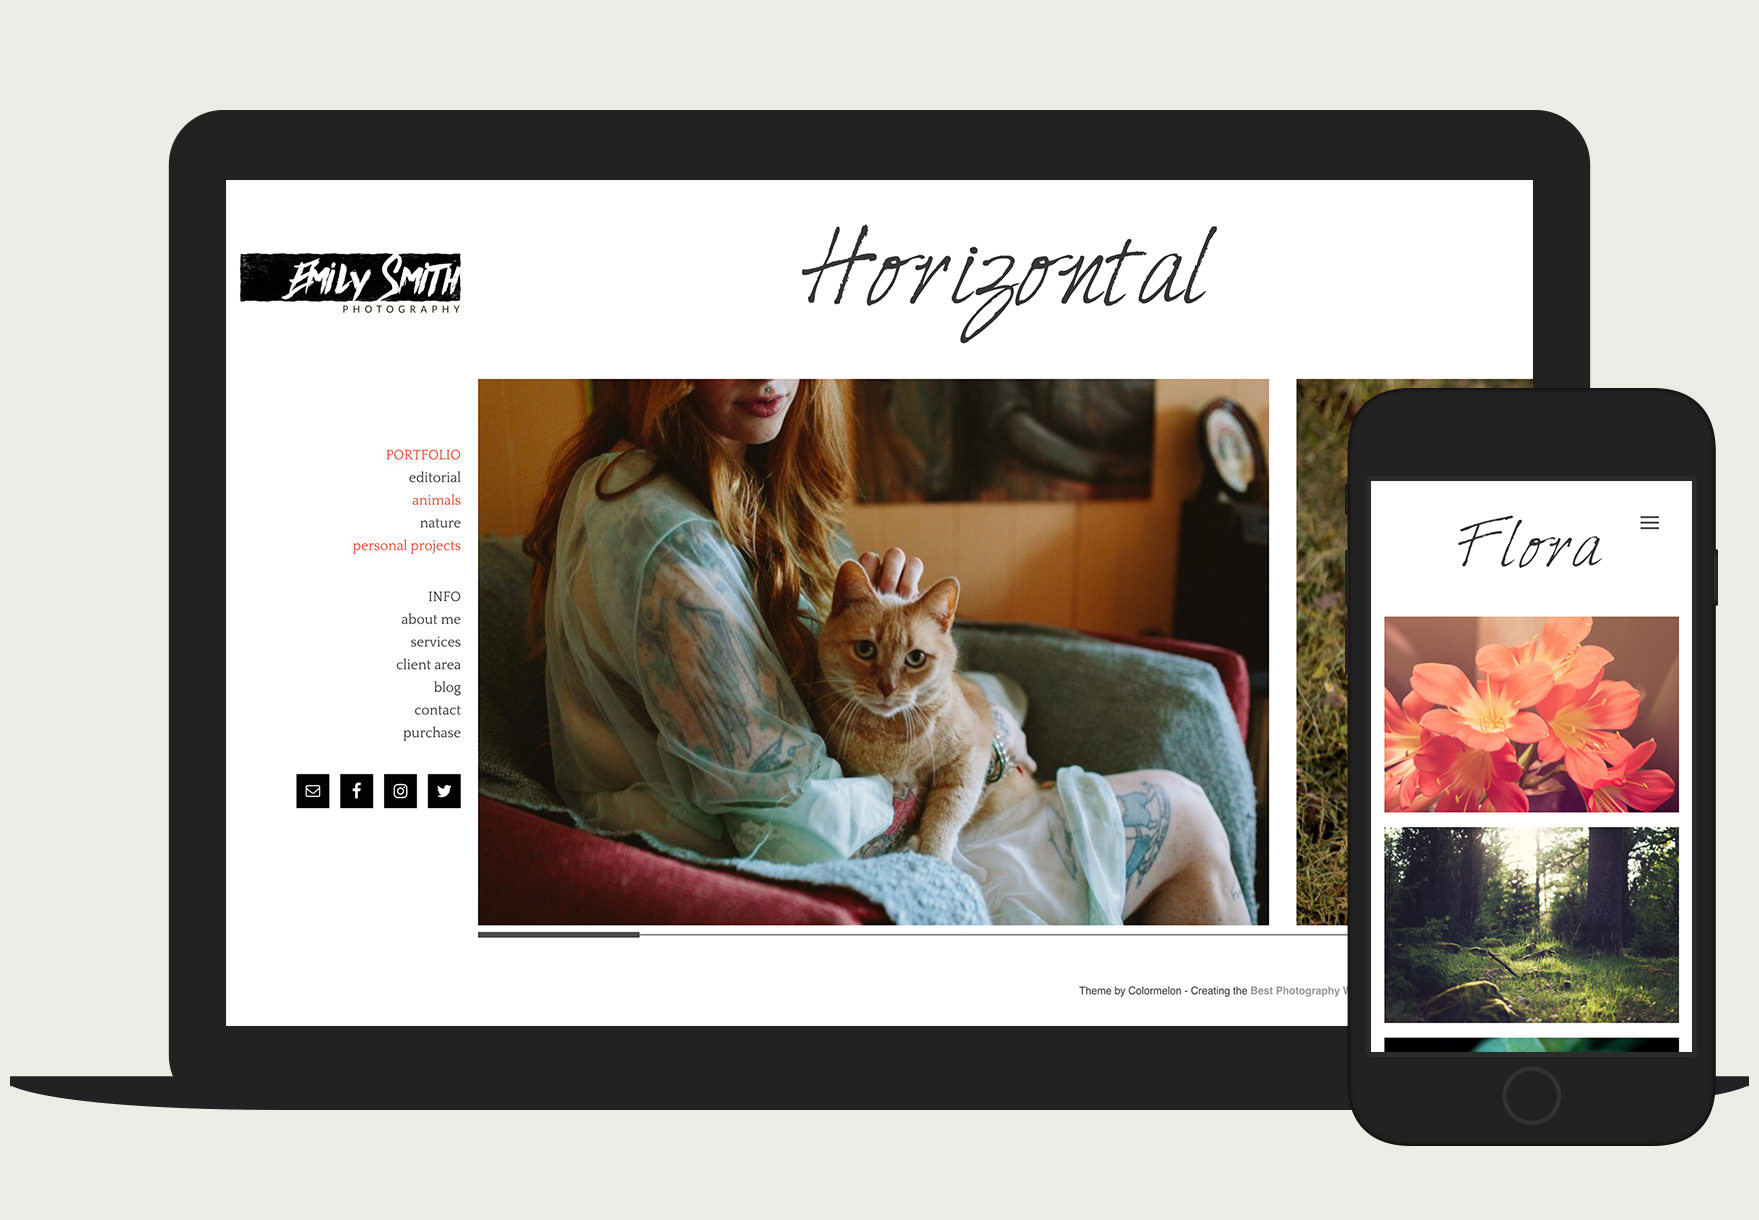 Emily theme by Colormelon - simple portfolio wordpress theme